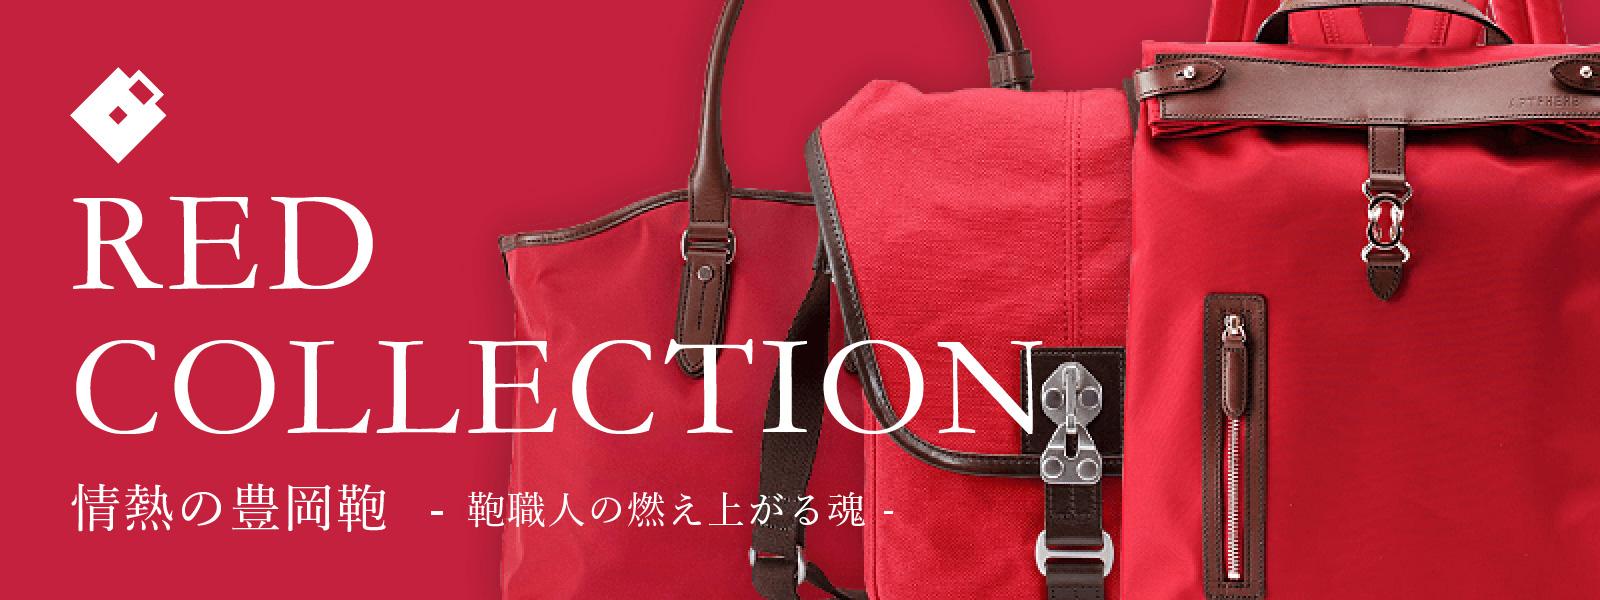 RED COLLECTION 情熱の豊岡鞄  - 鞄職人の燃え上がる魂 -